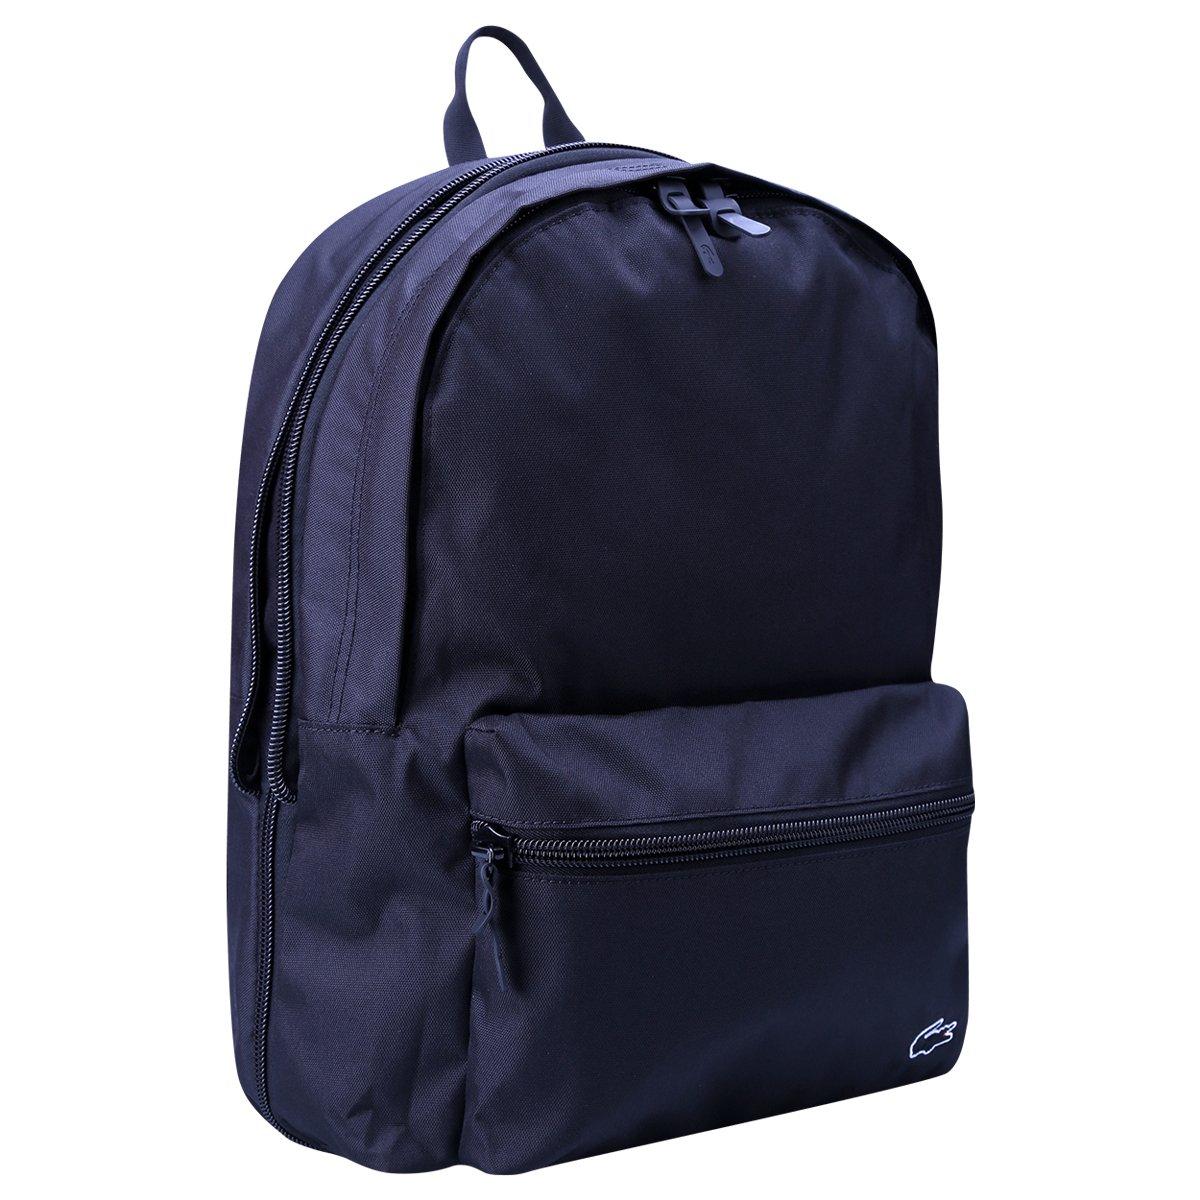 Mochila Lacoste Large Backpack  Mochila Lacoste Large Backpack ... 0f77638fb1